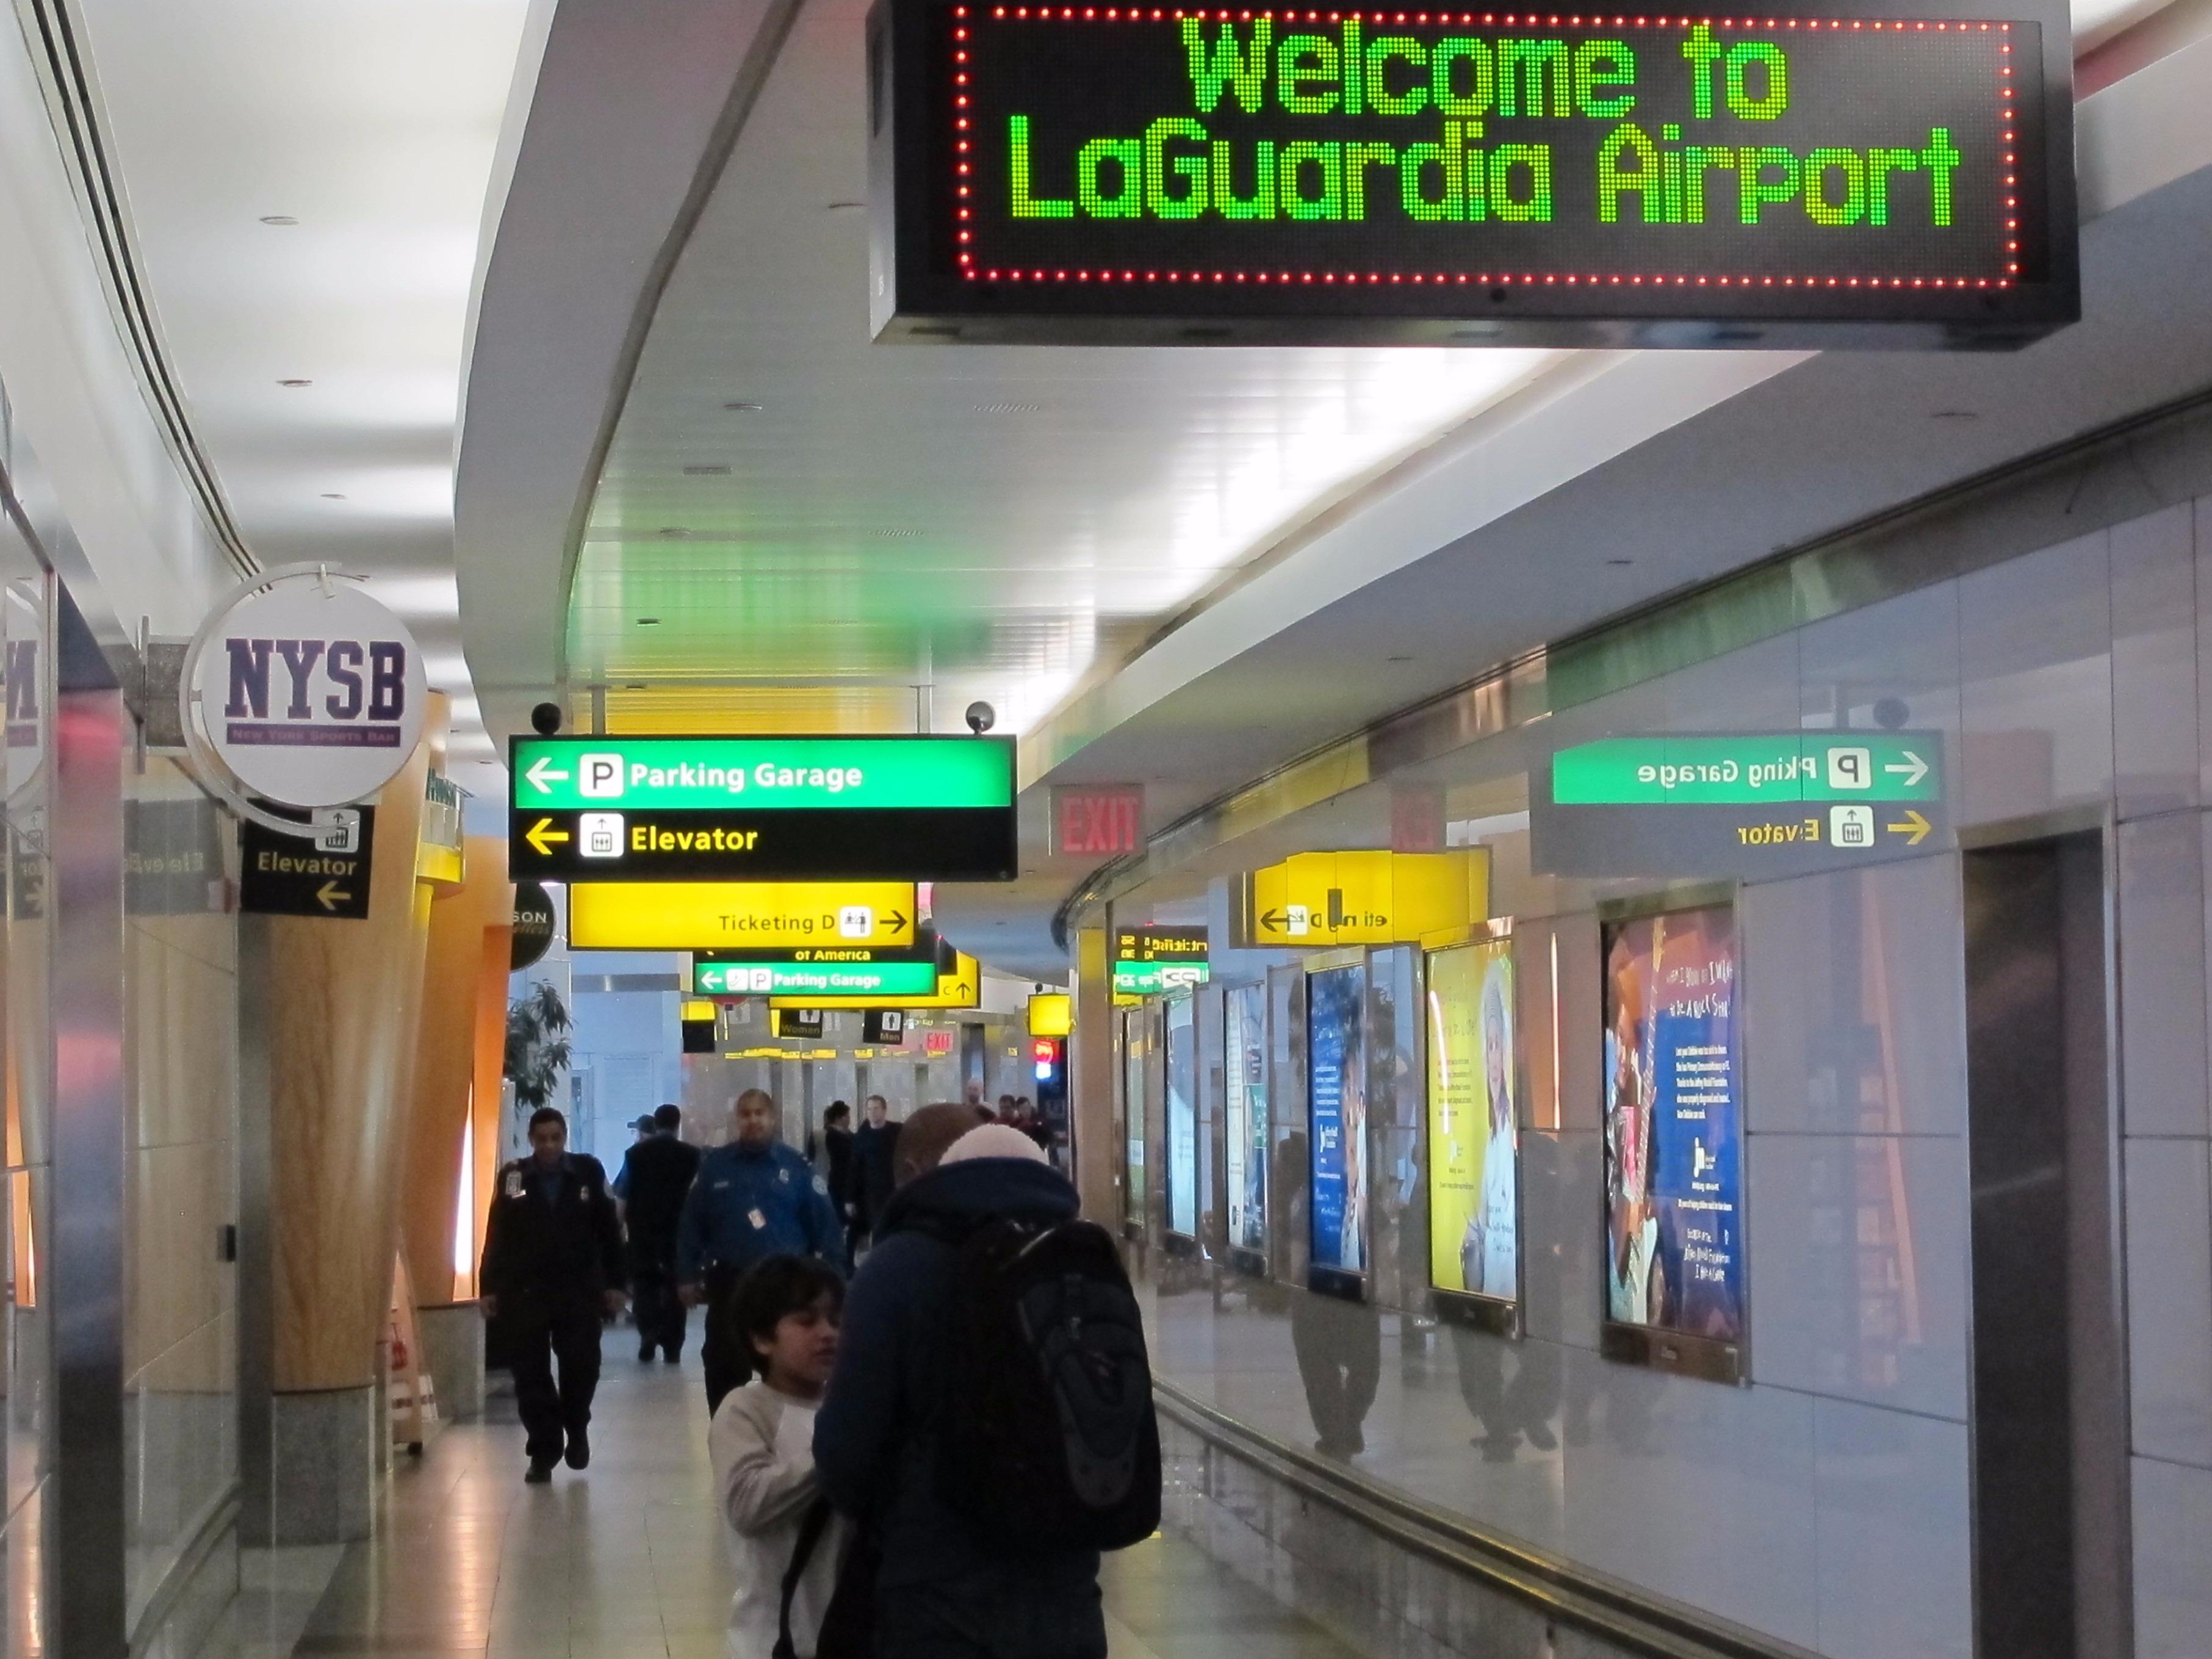 Passengers manoeuvre through cramped hallways at New York's La Guardia Airport